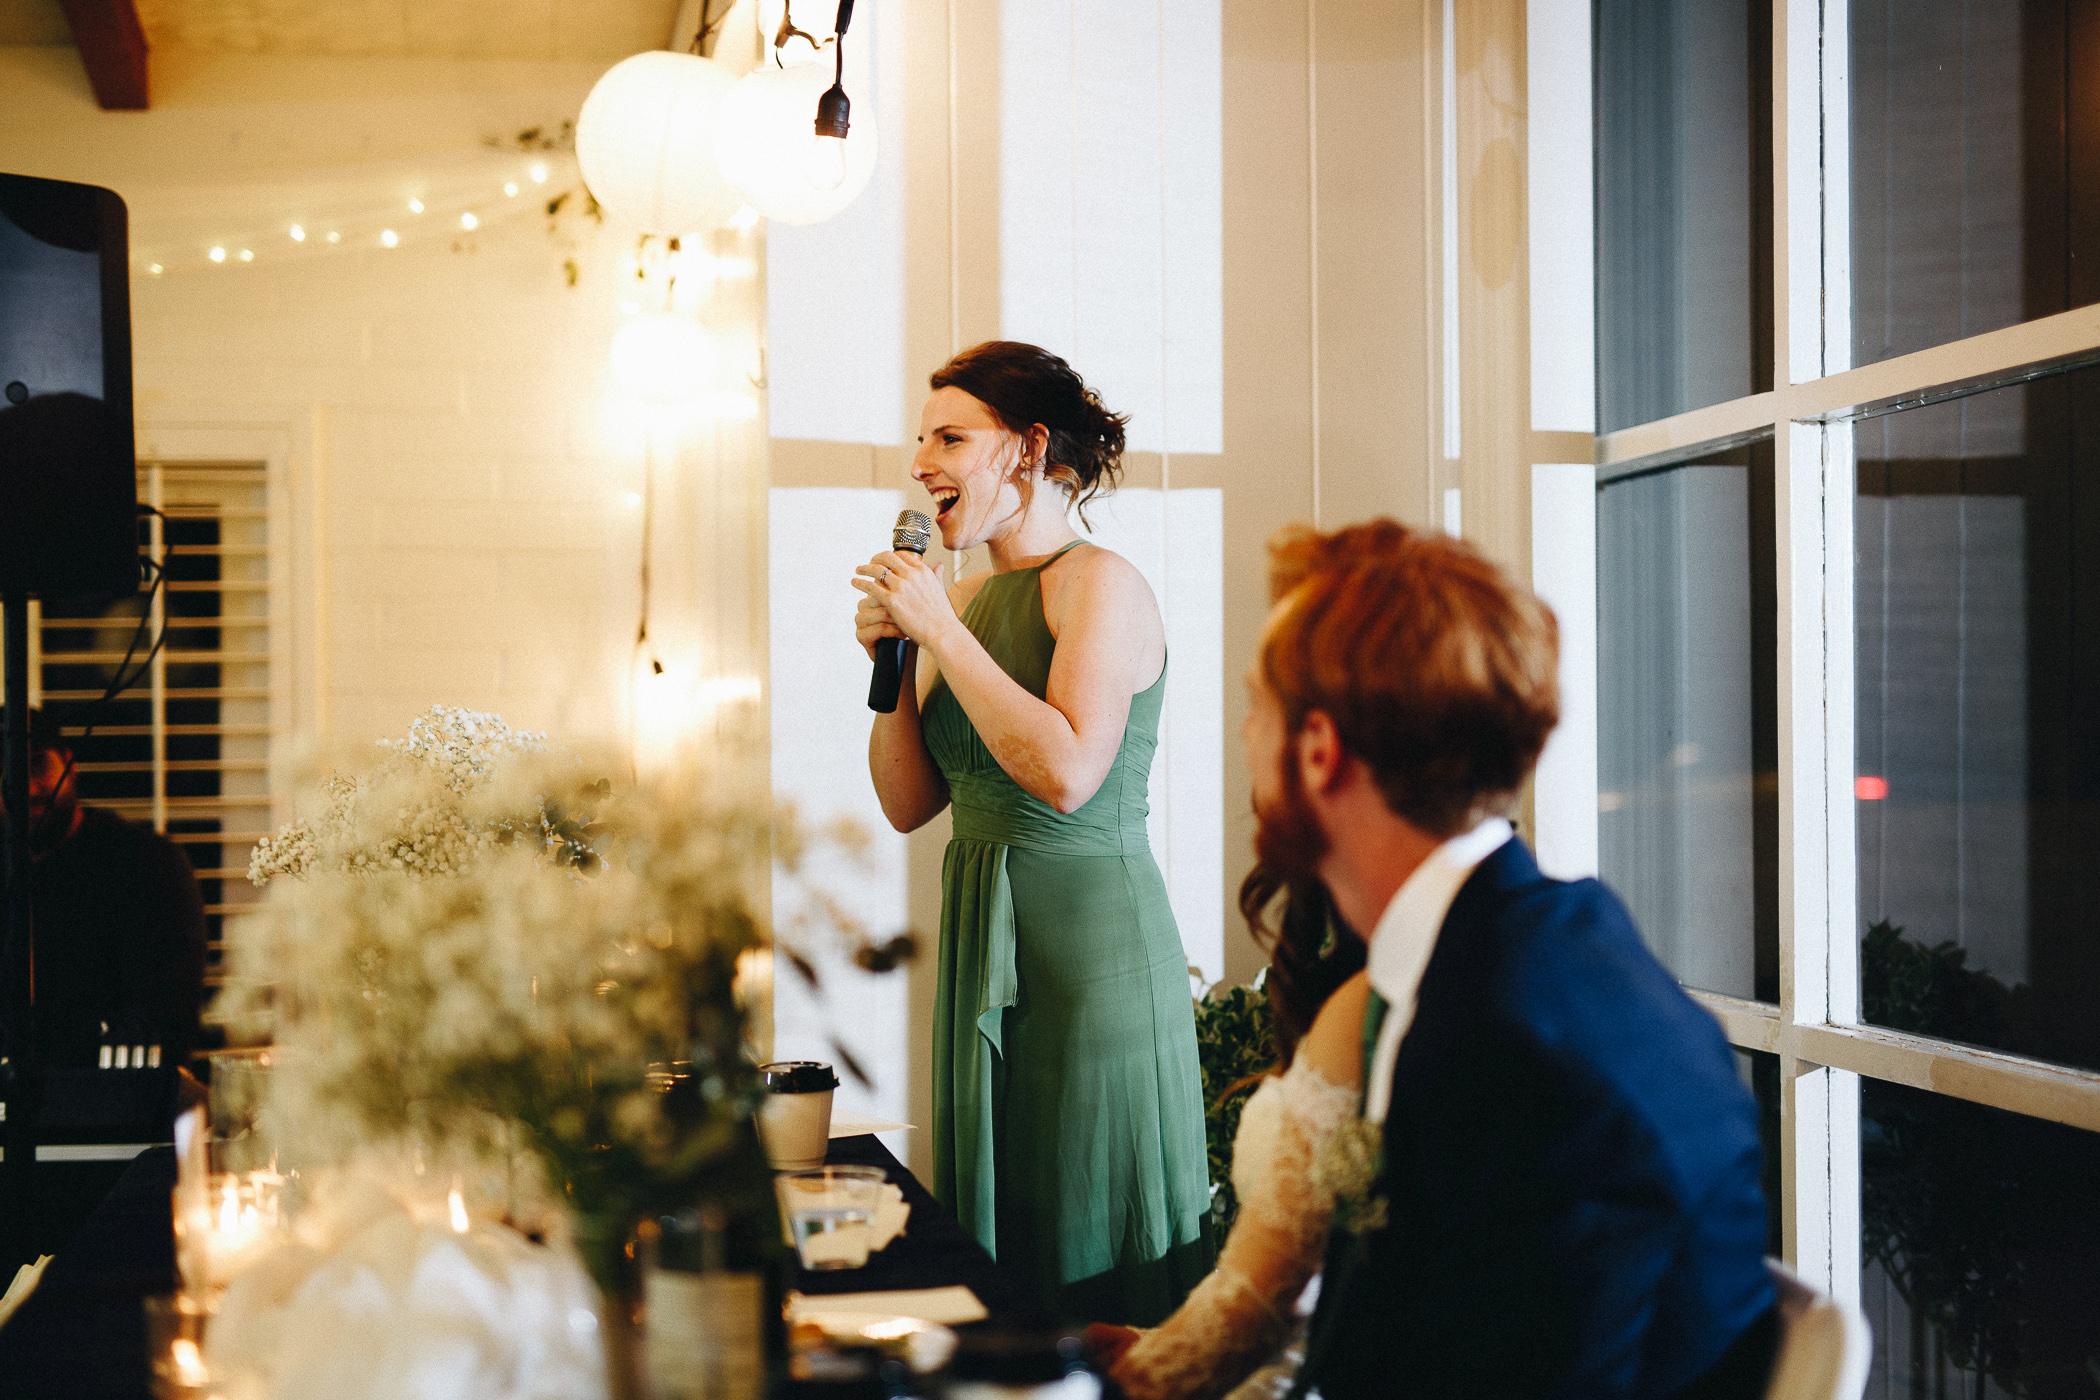 181104-Luxium-Weddings-Arizona-@matt__Le-Brandon-Kariana-Phoenix-Valley-Garden-Center-1128.jpg